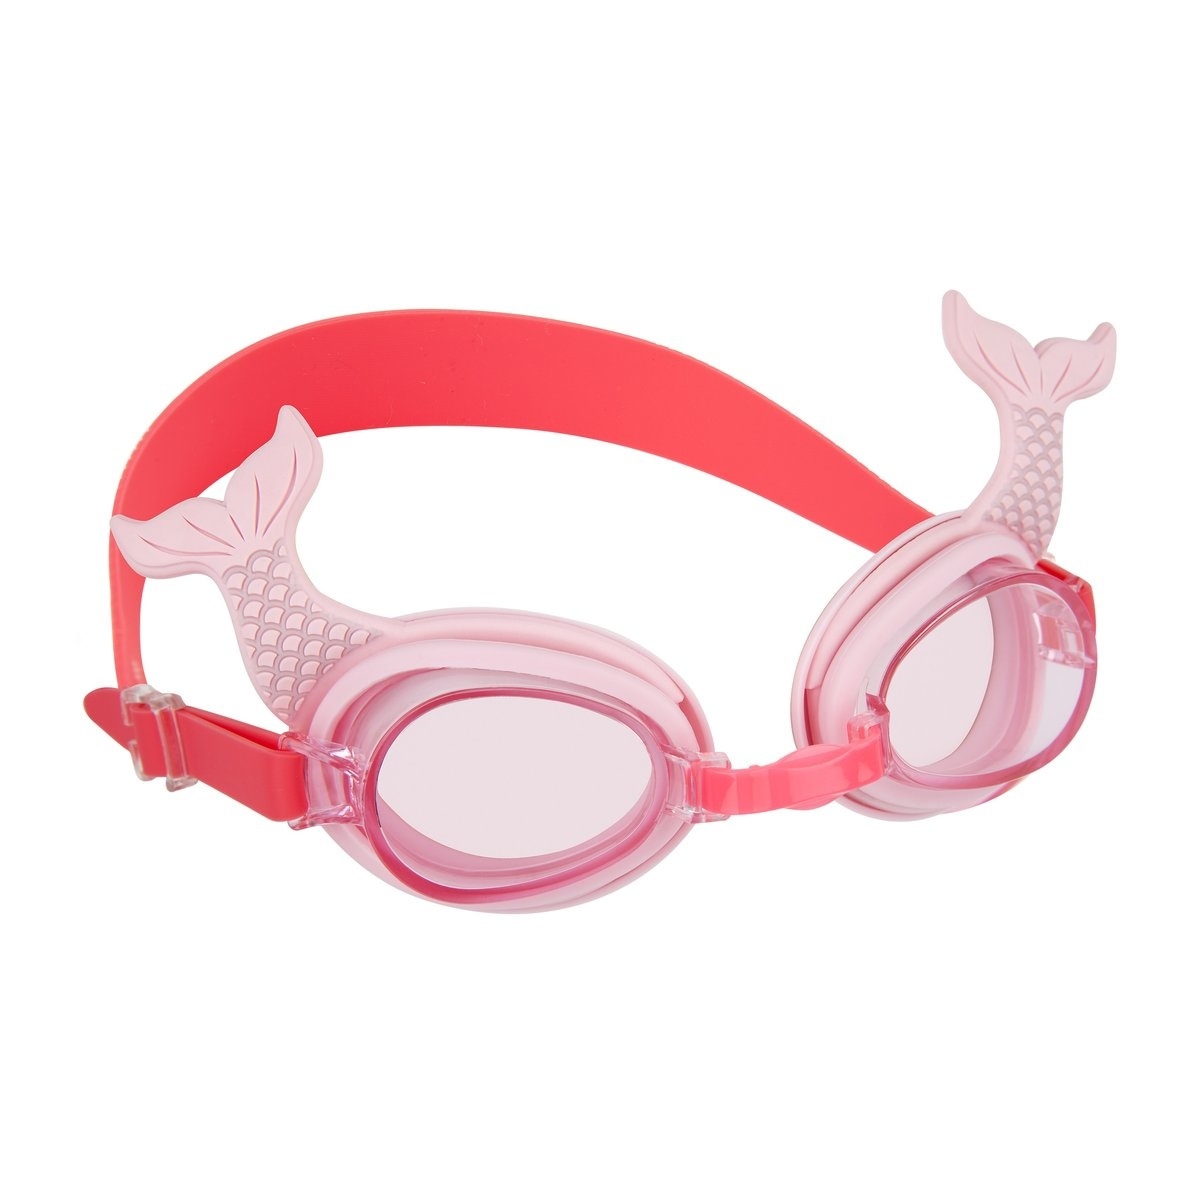 Sunny Life Swim Goggles  Mermaid